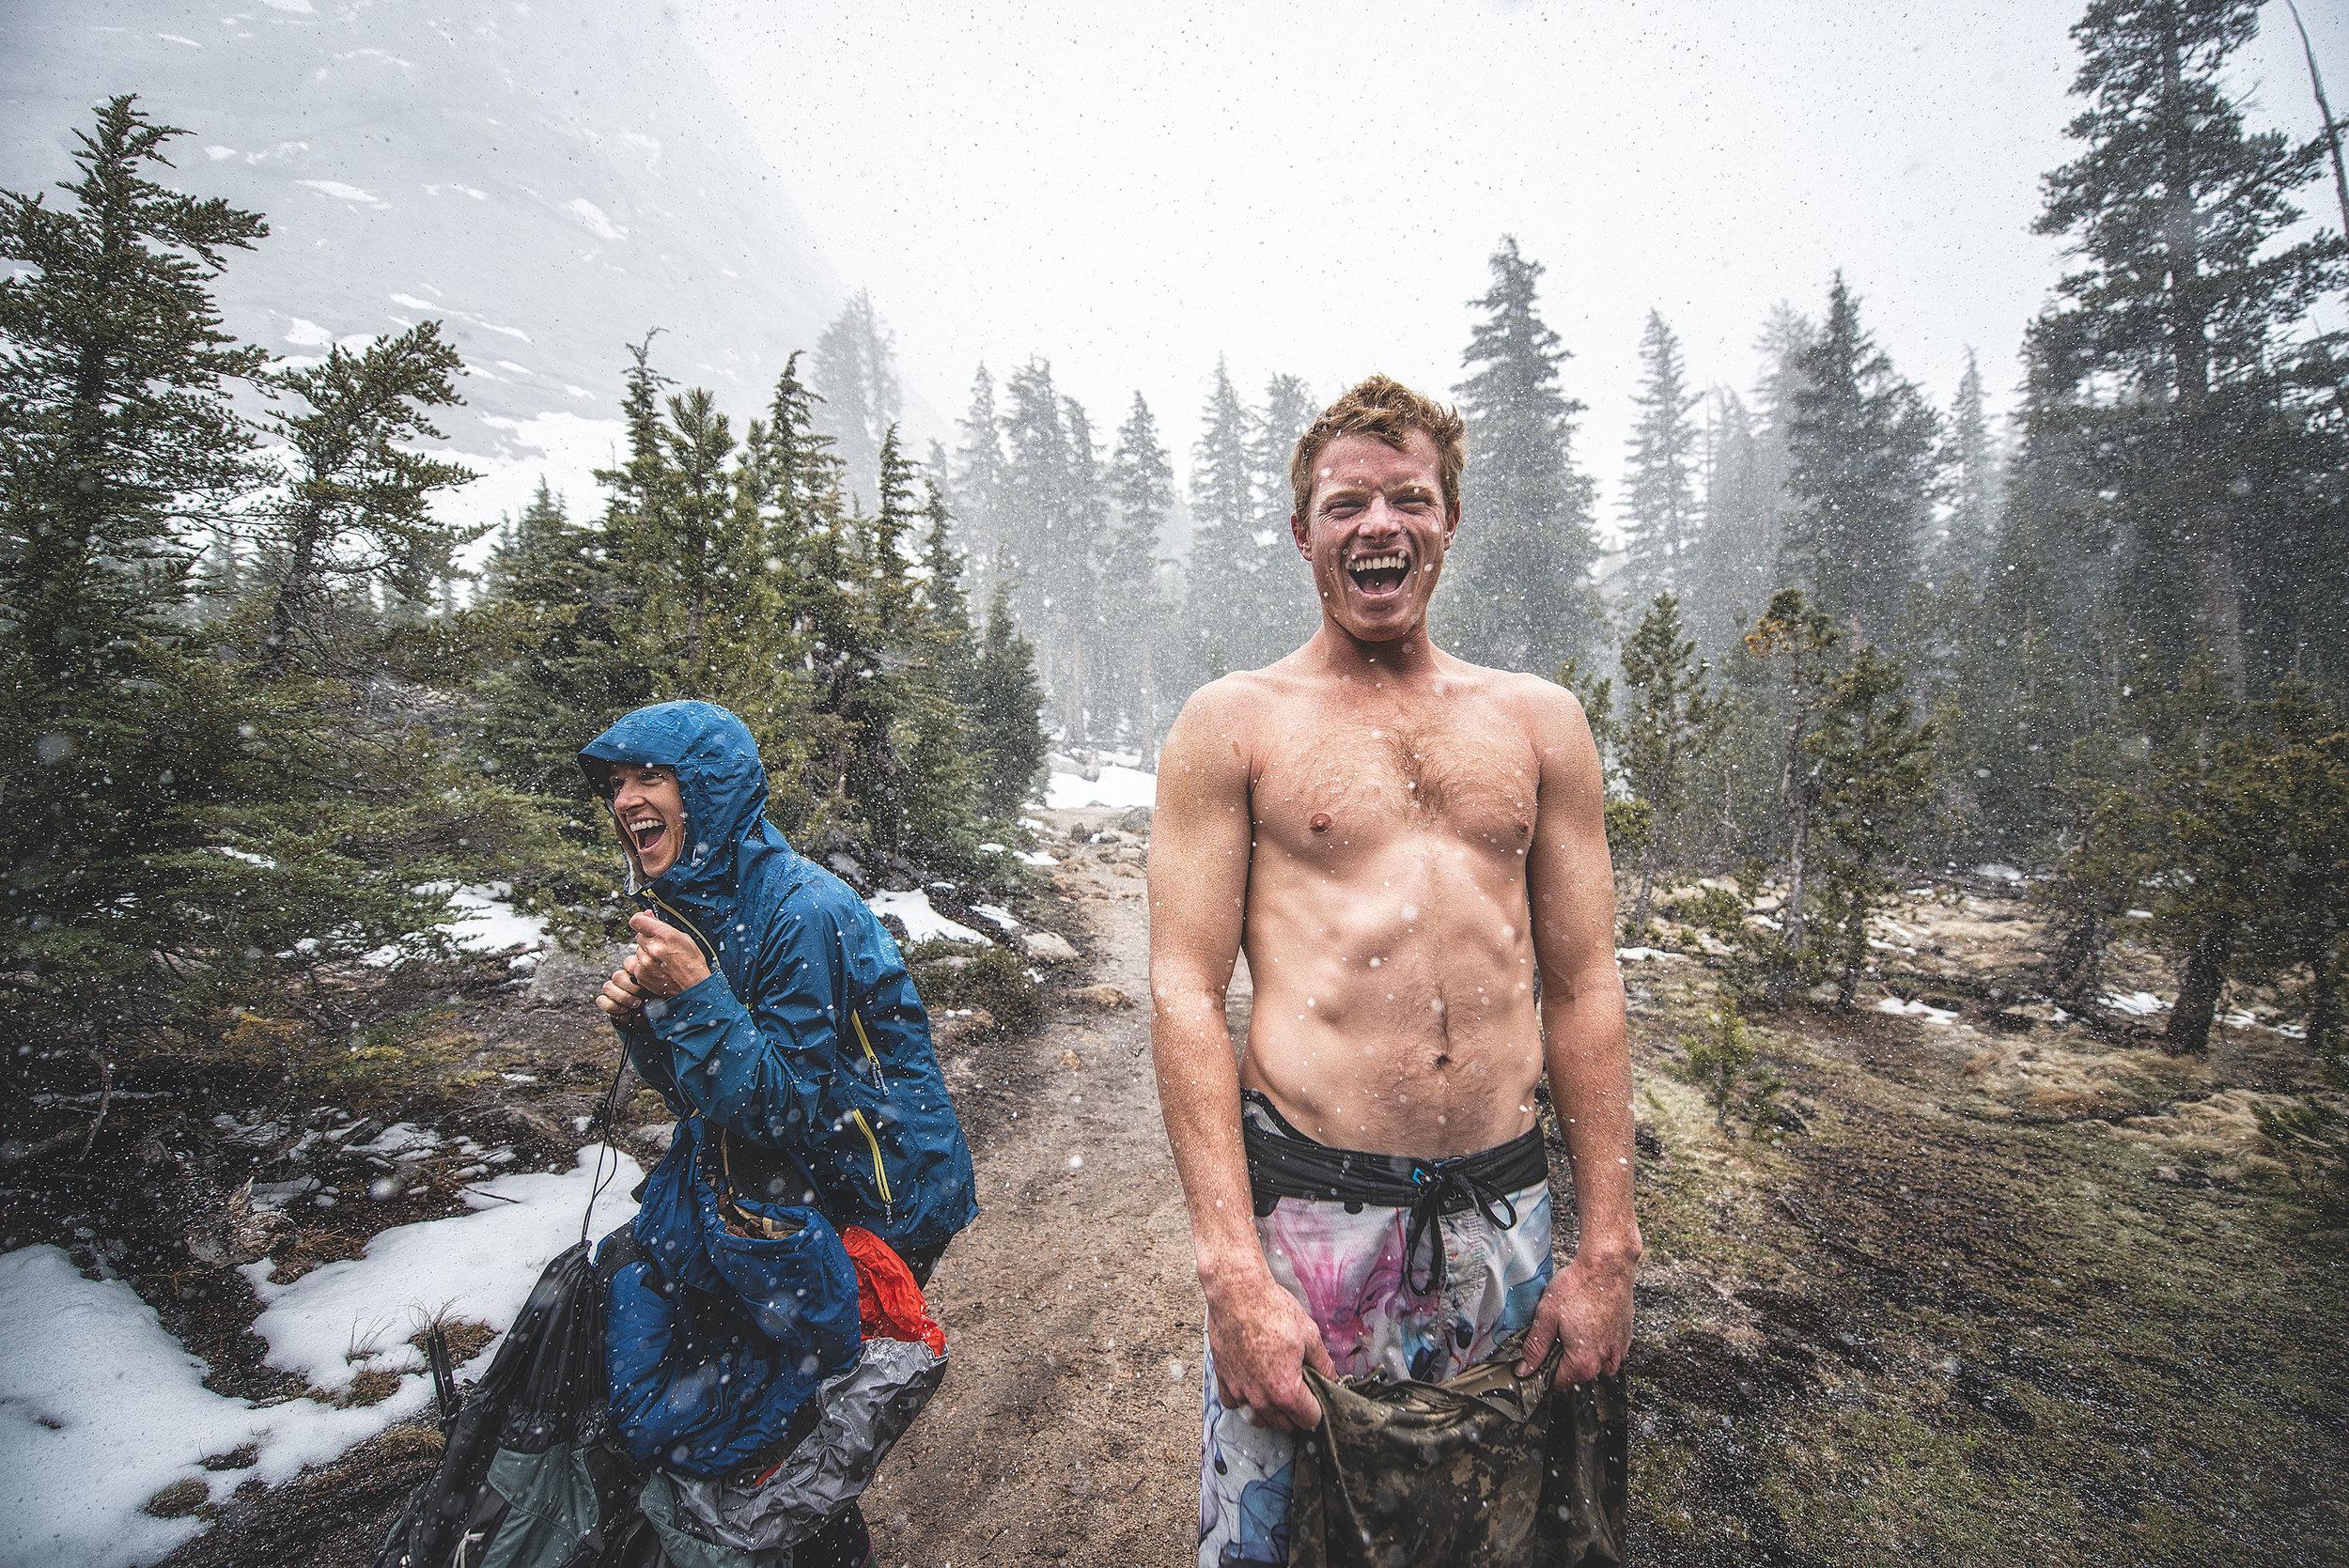 austin-trigg-yosemite-national-park-lifestyle-adventure-snowing-hiking-trail-laughing-good-vibes-smile.jpg